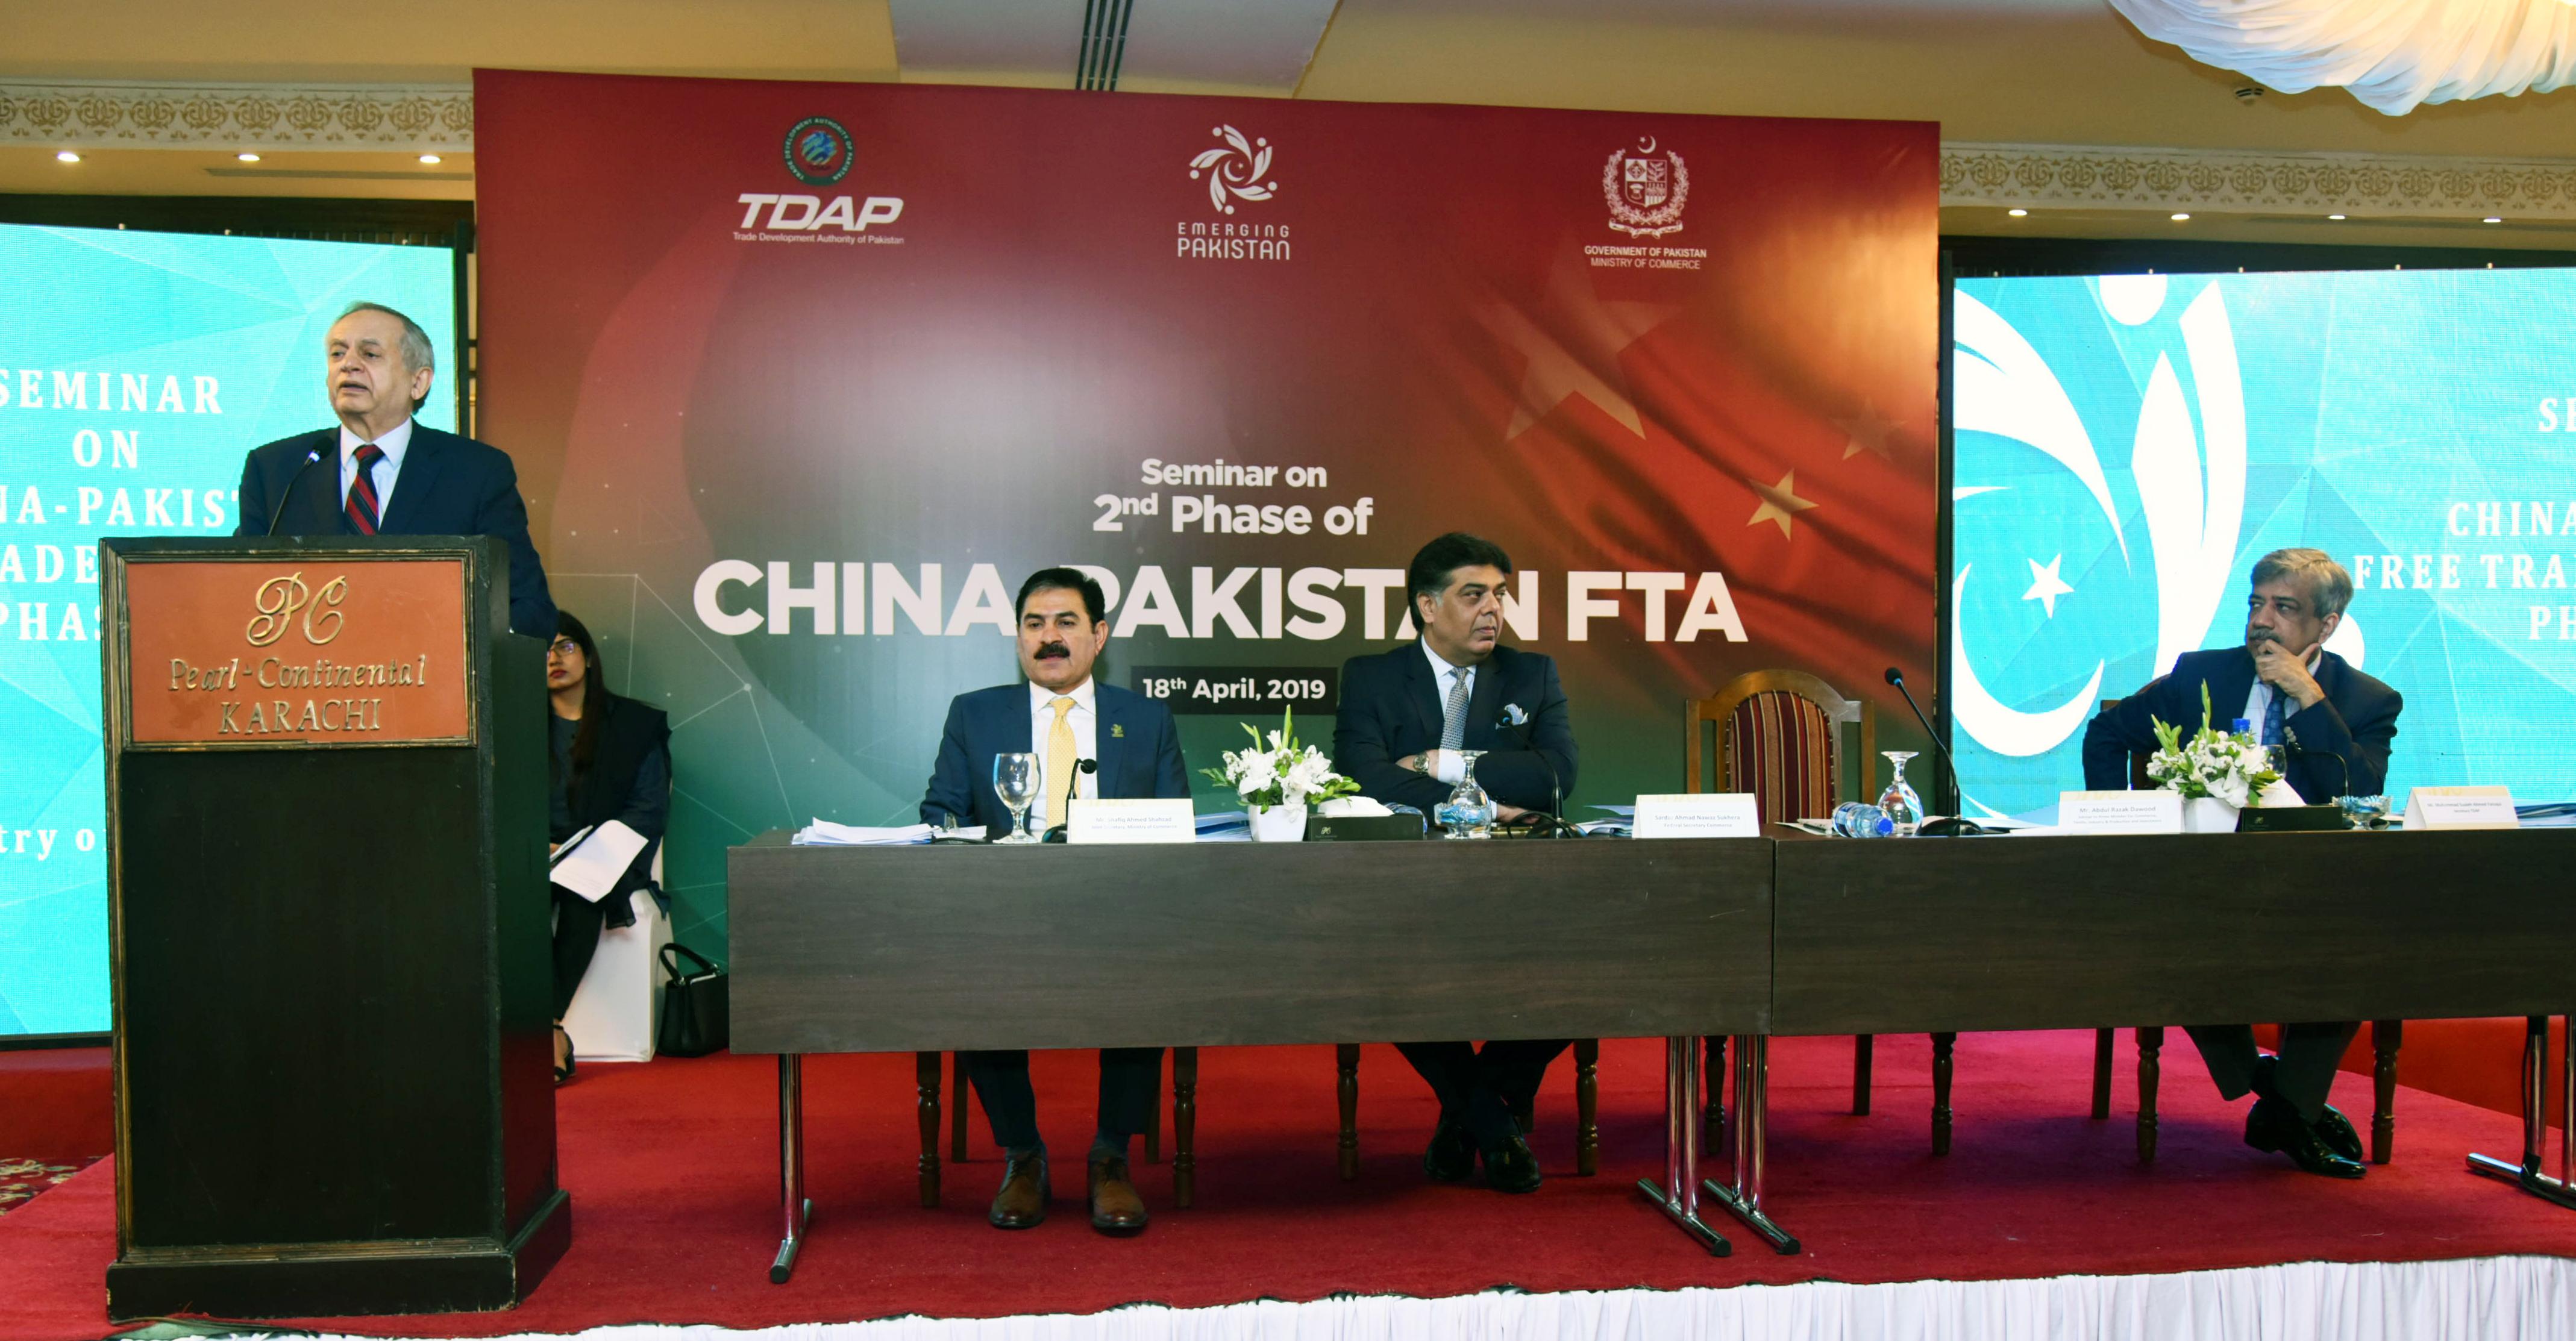 SEMINAR ON 2nd PHASE OF PAKISTAN-CHINA FTA - Daily Karachi